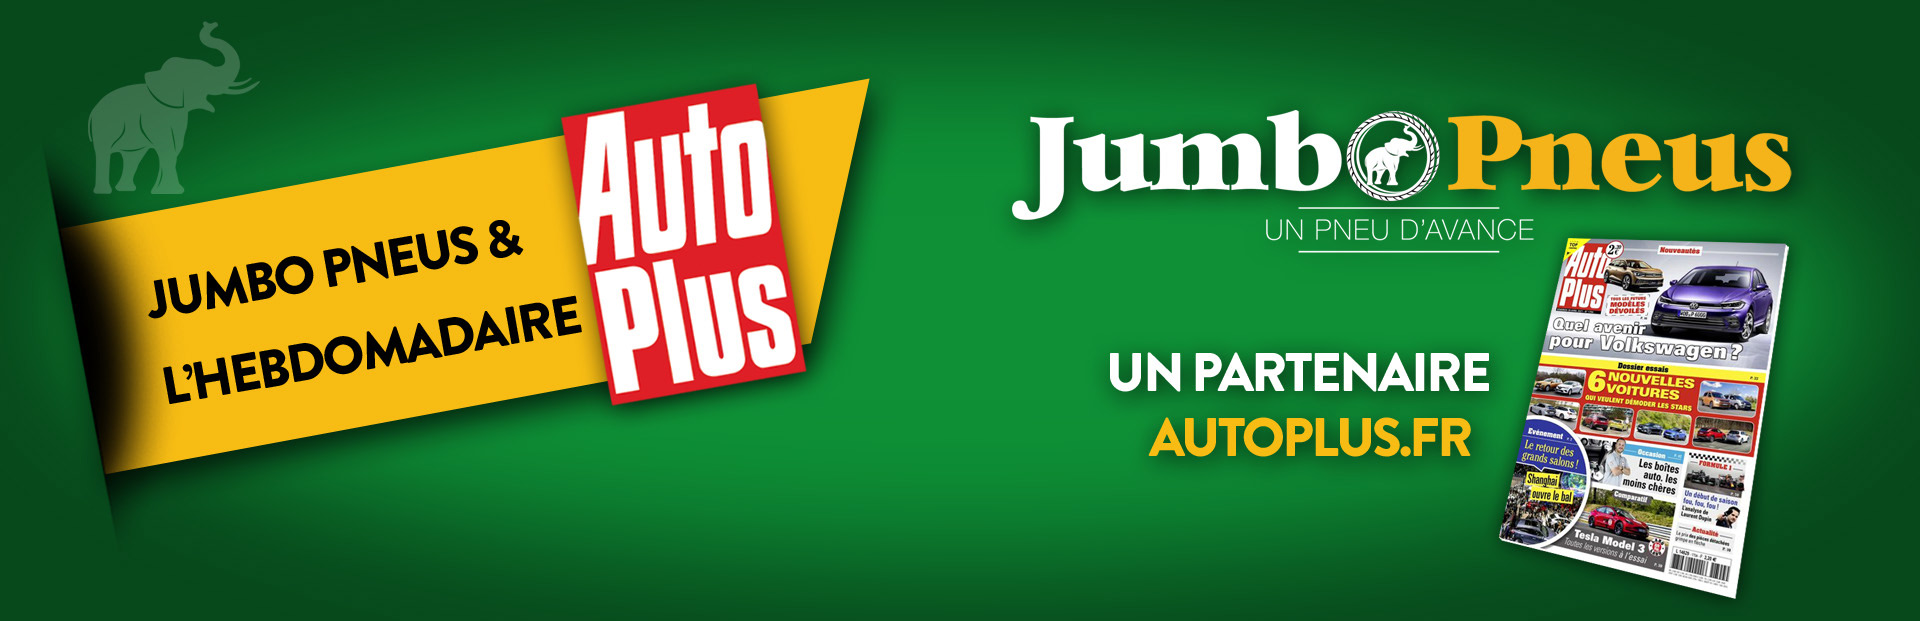 Jumbo Pneus - Partnaire Auto Plus